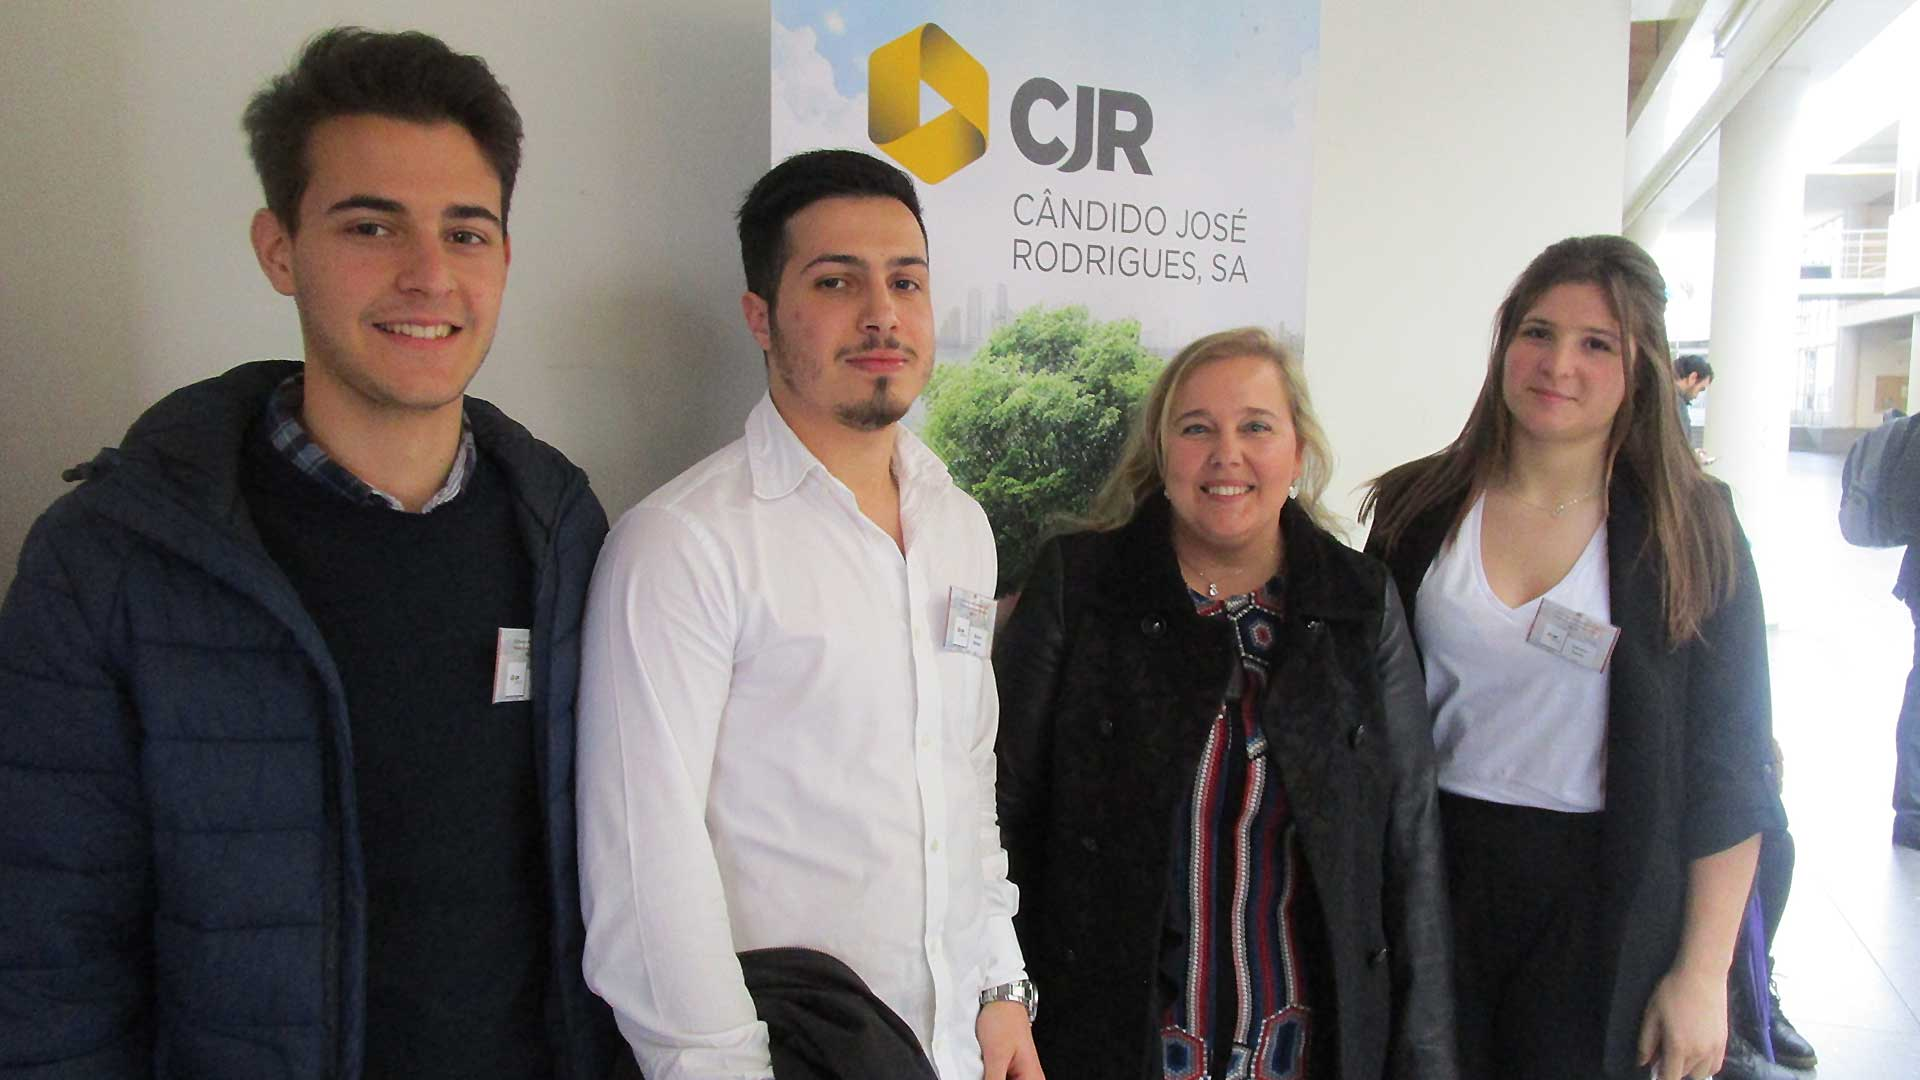 CJR Grupo